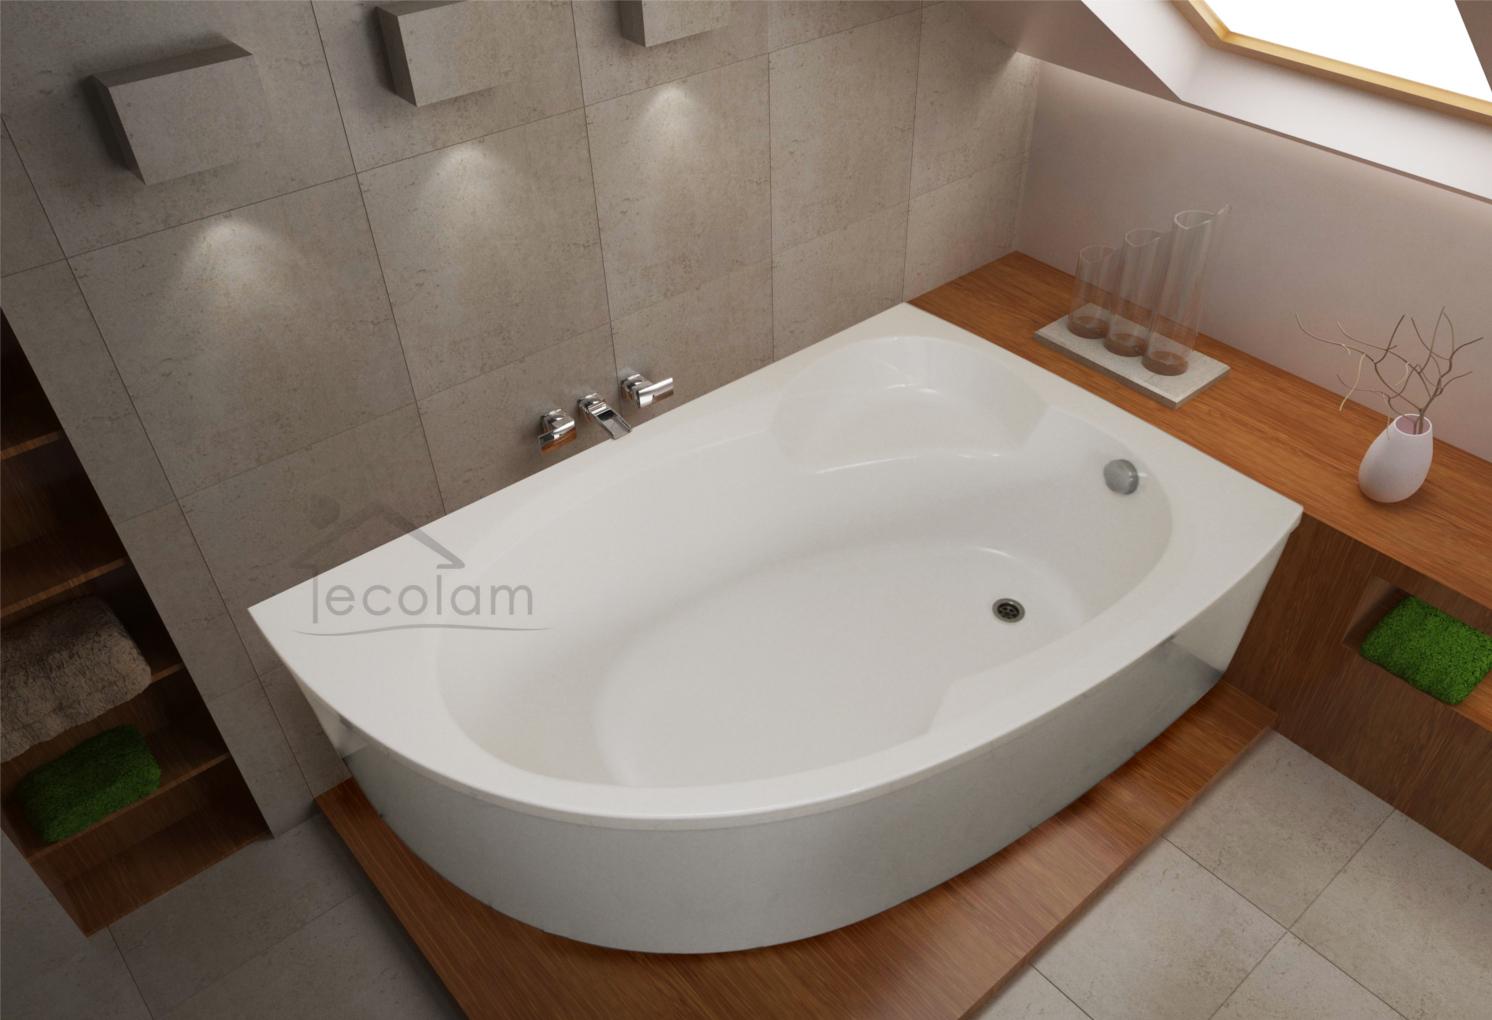 badewanne wanne acryl eckbadewanne wei 170 x 100 sch rze. Black Bedroom Furniture Sets. Home Design Ideas